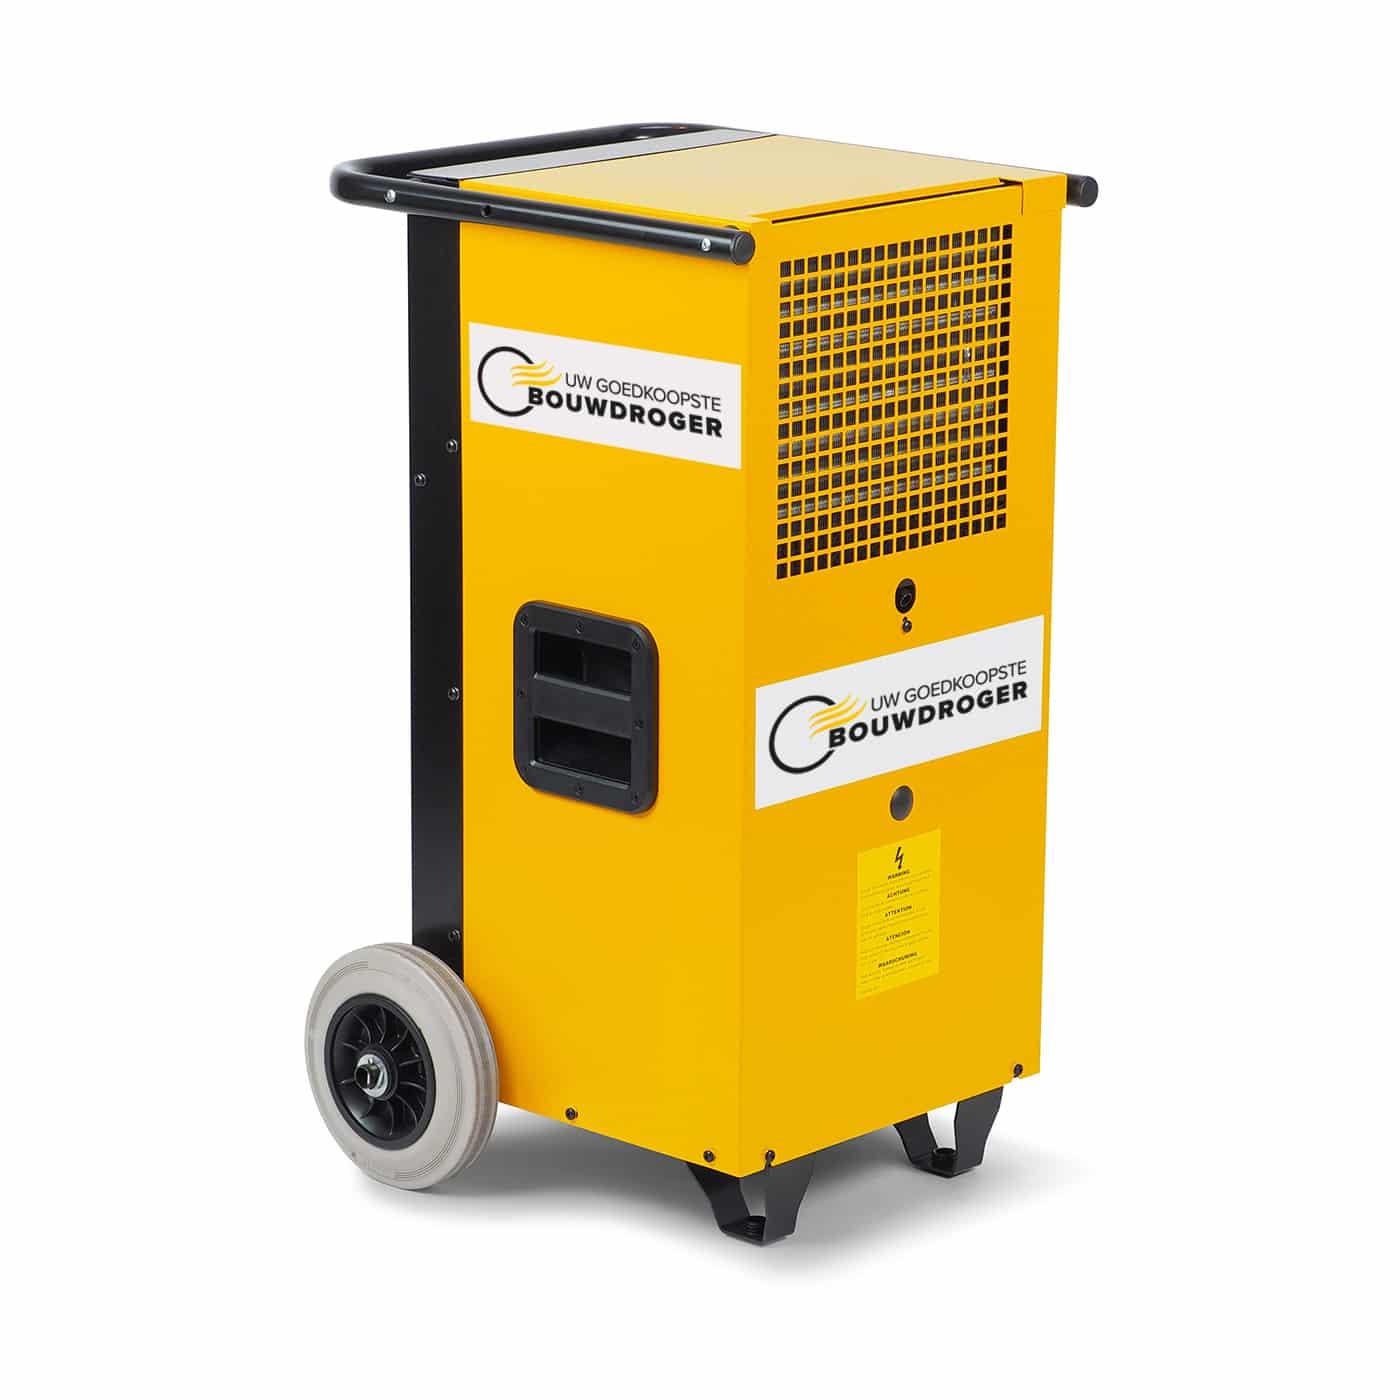 DF400F-min bouwdrogers-huren